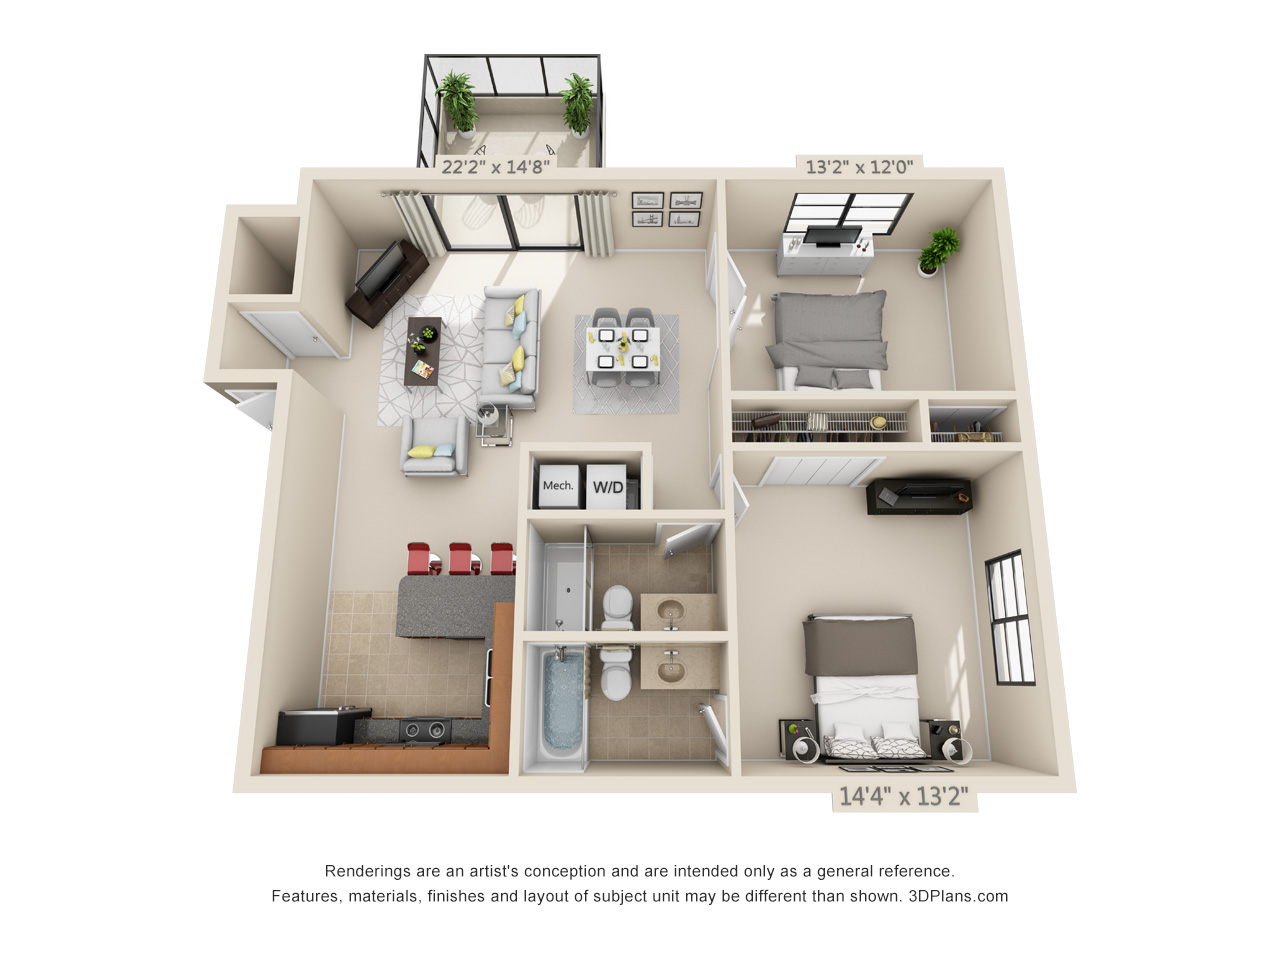 1 bedroom apartment in Boca Raton, FL